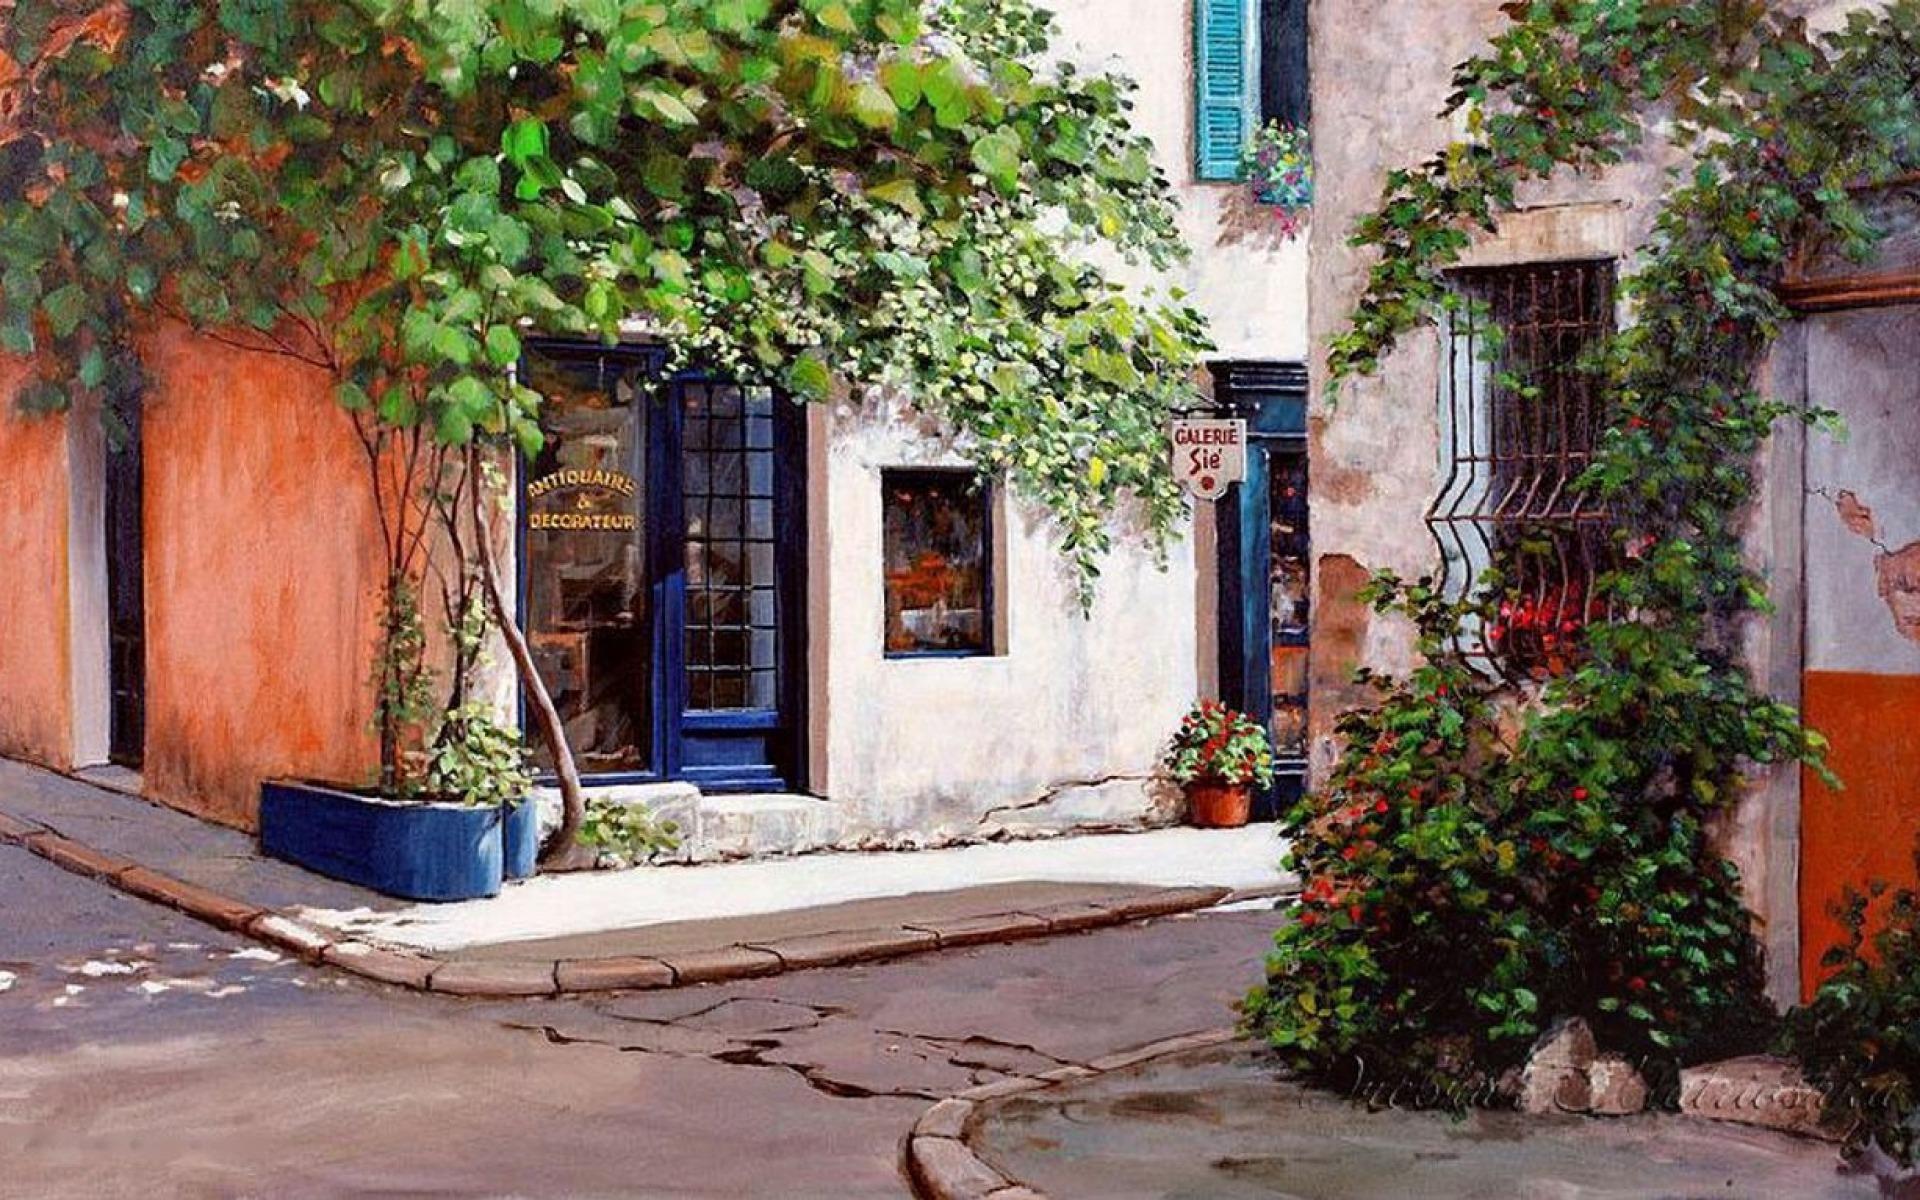 Antiques Shops Provence France wallpapers Antiques Shops 1920x1200